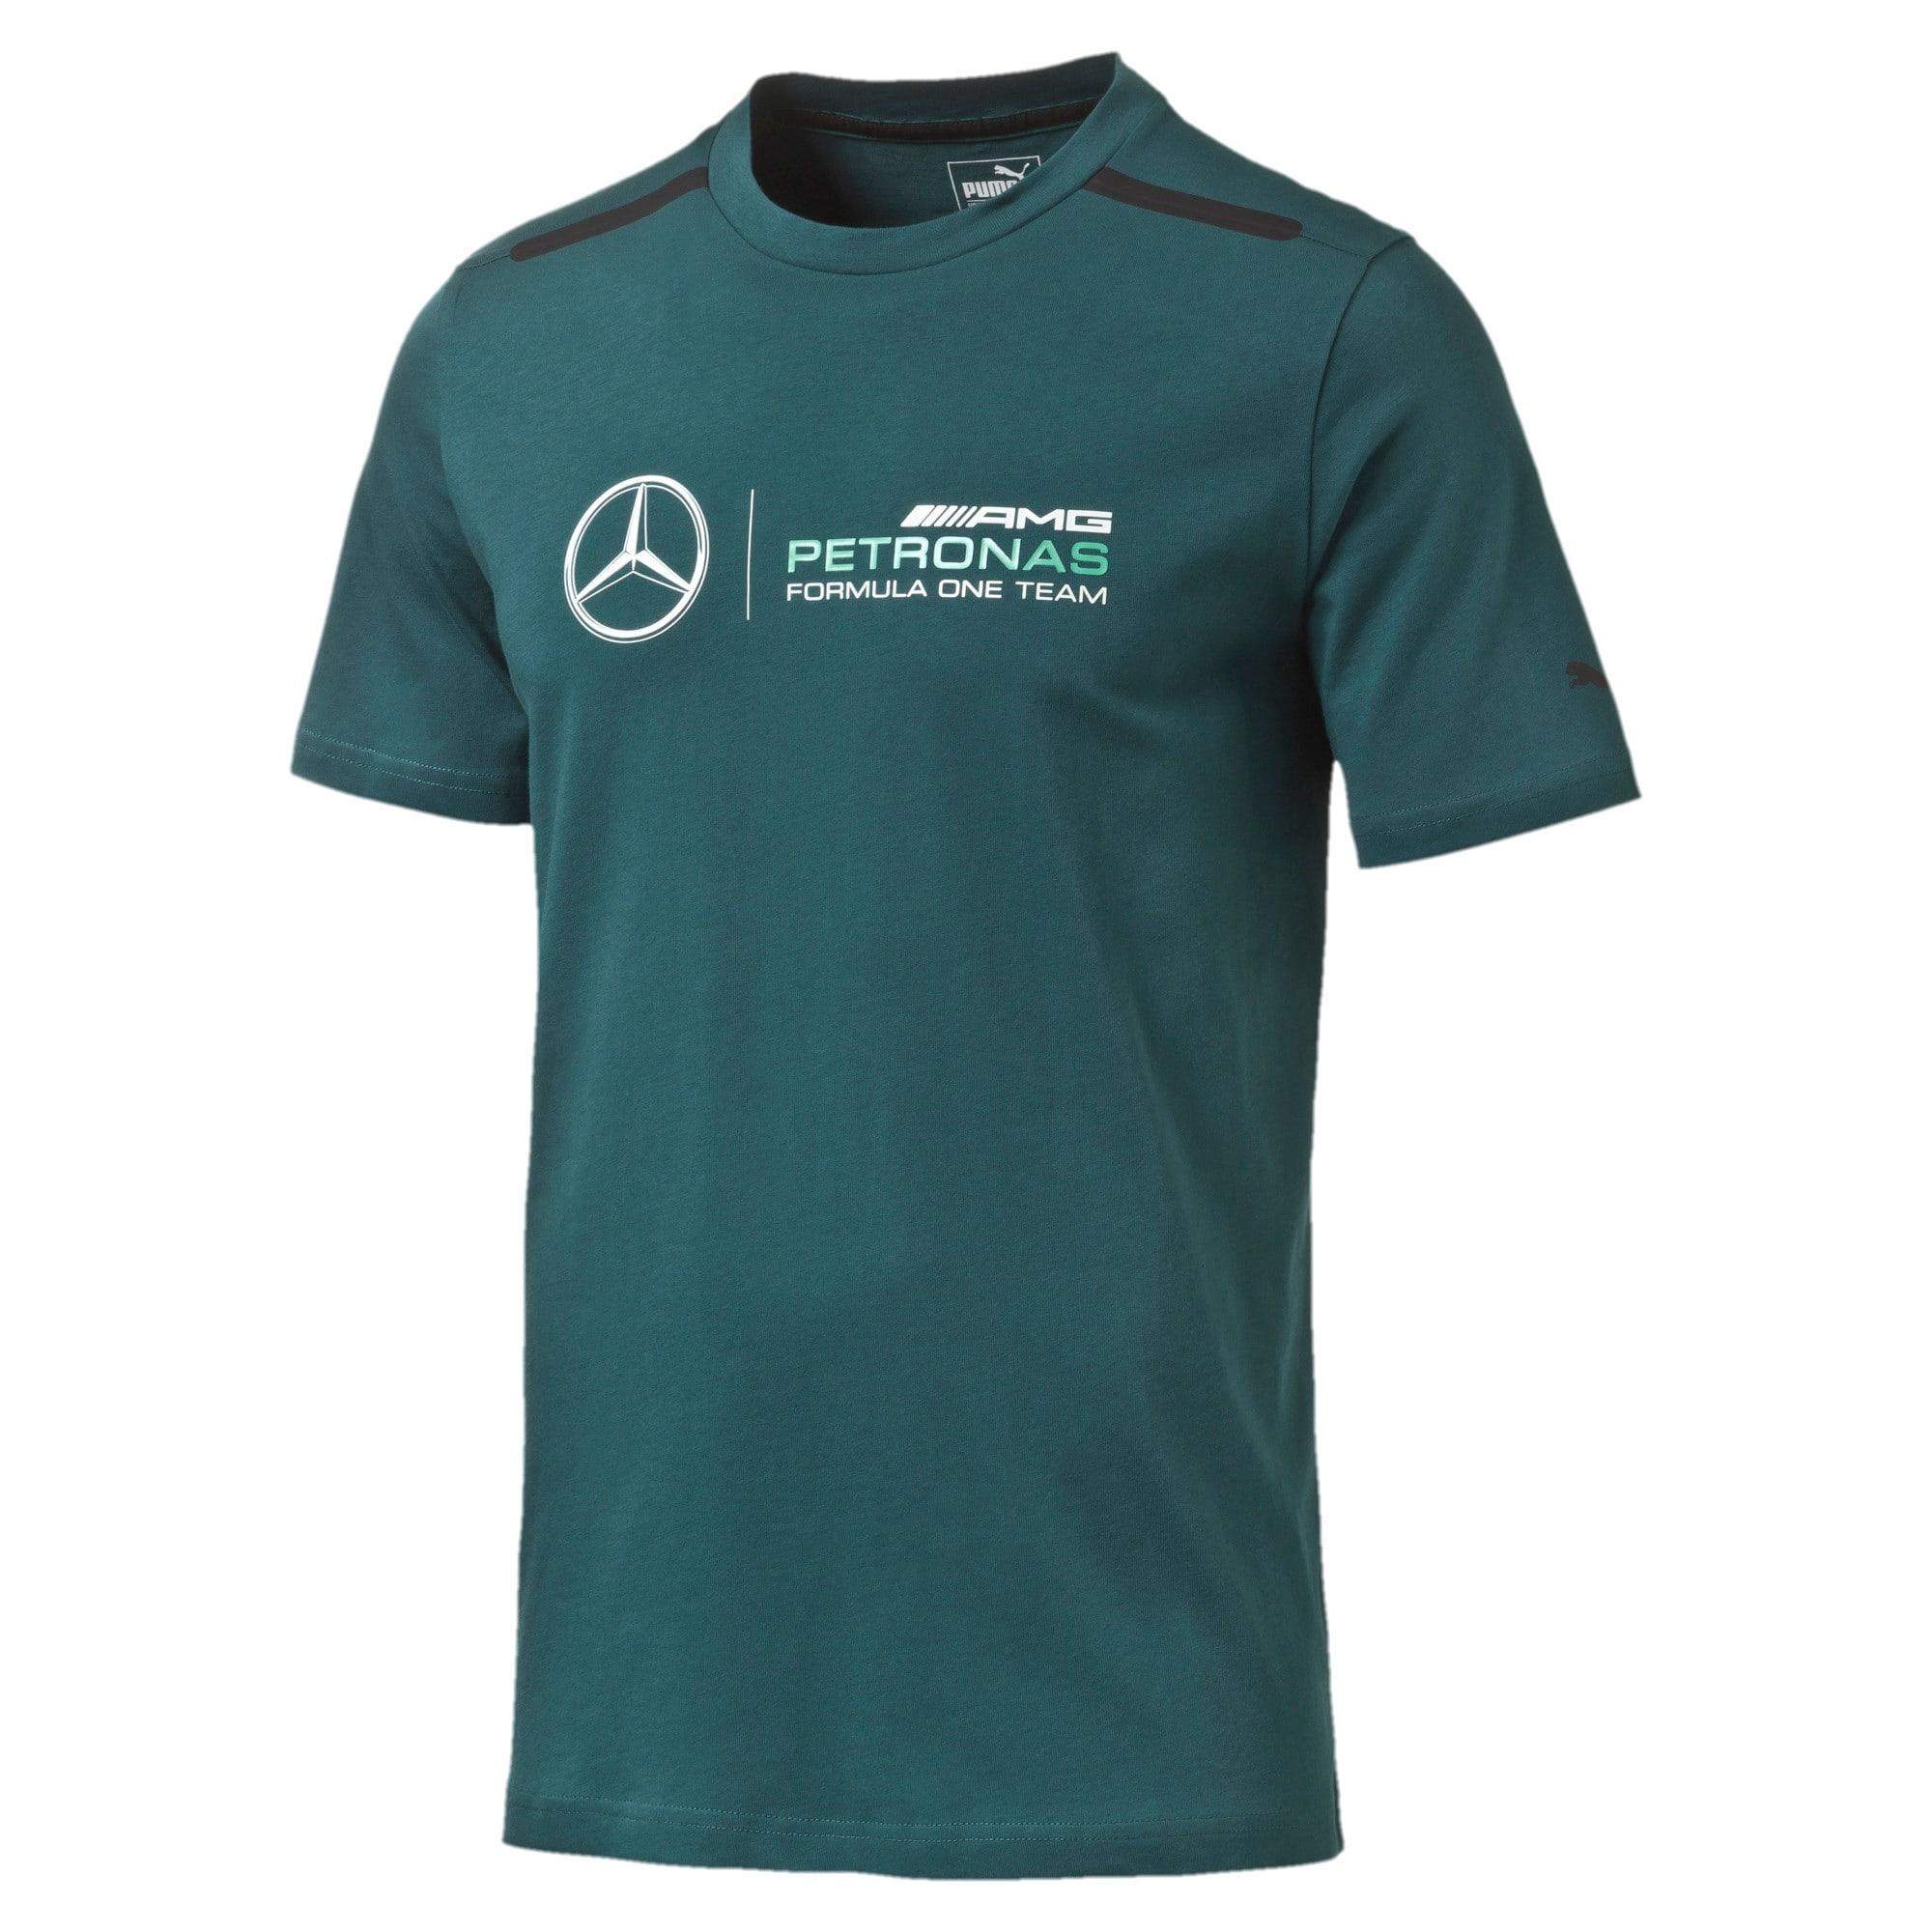 Thumbnail 1 of MERCEDES AMG PETRONAS Men's Logo T-Shirt, Deep Teal, medium-IND